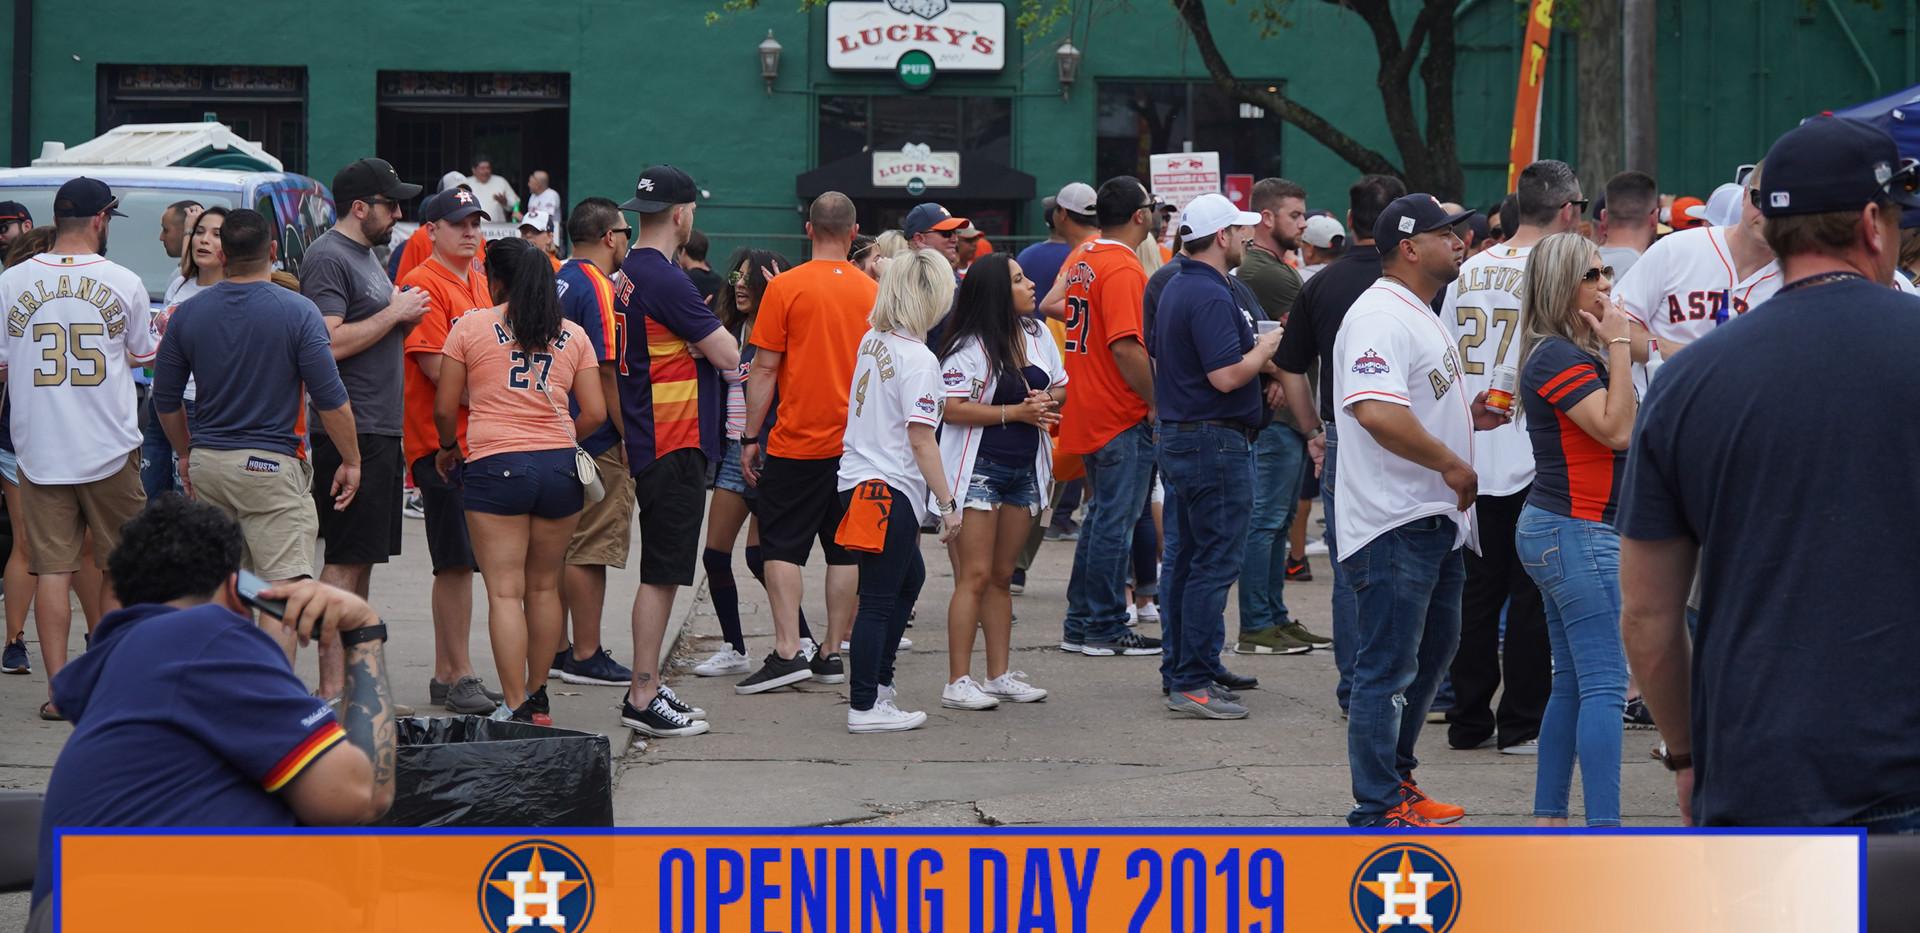 Opening Day 2019 FiveSe7enMarketing.com-